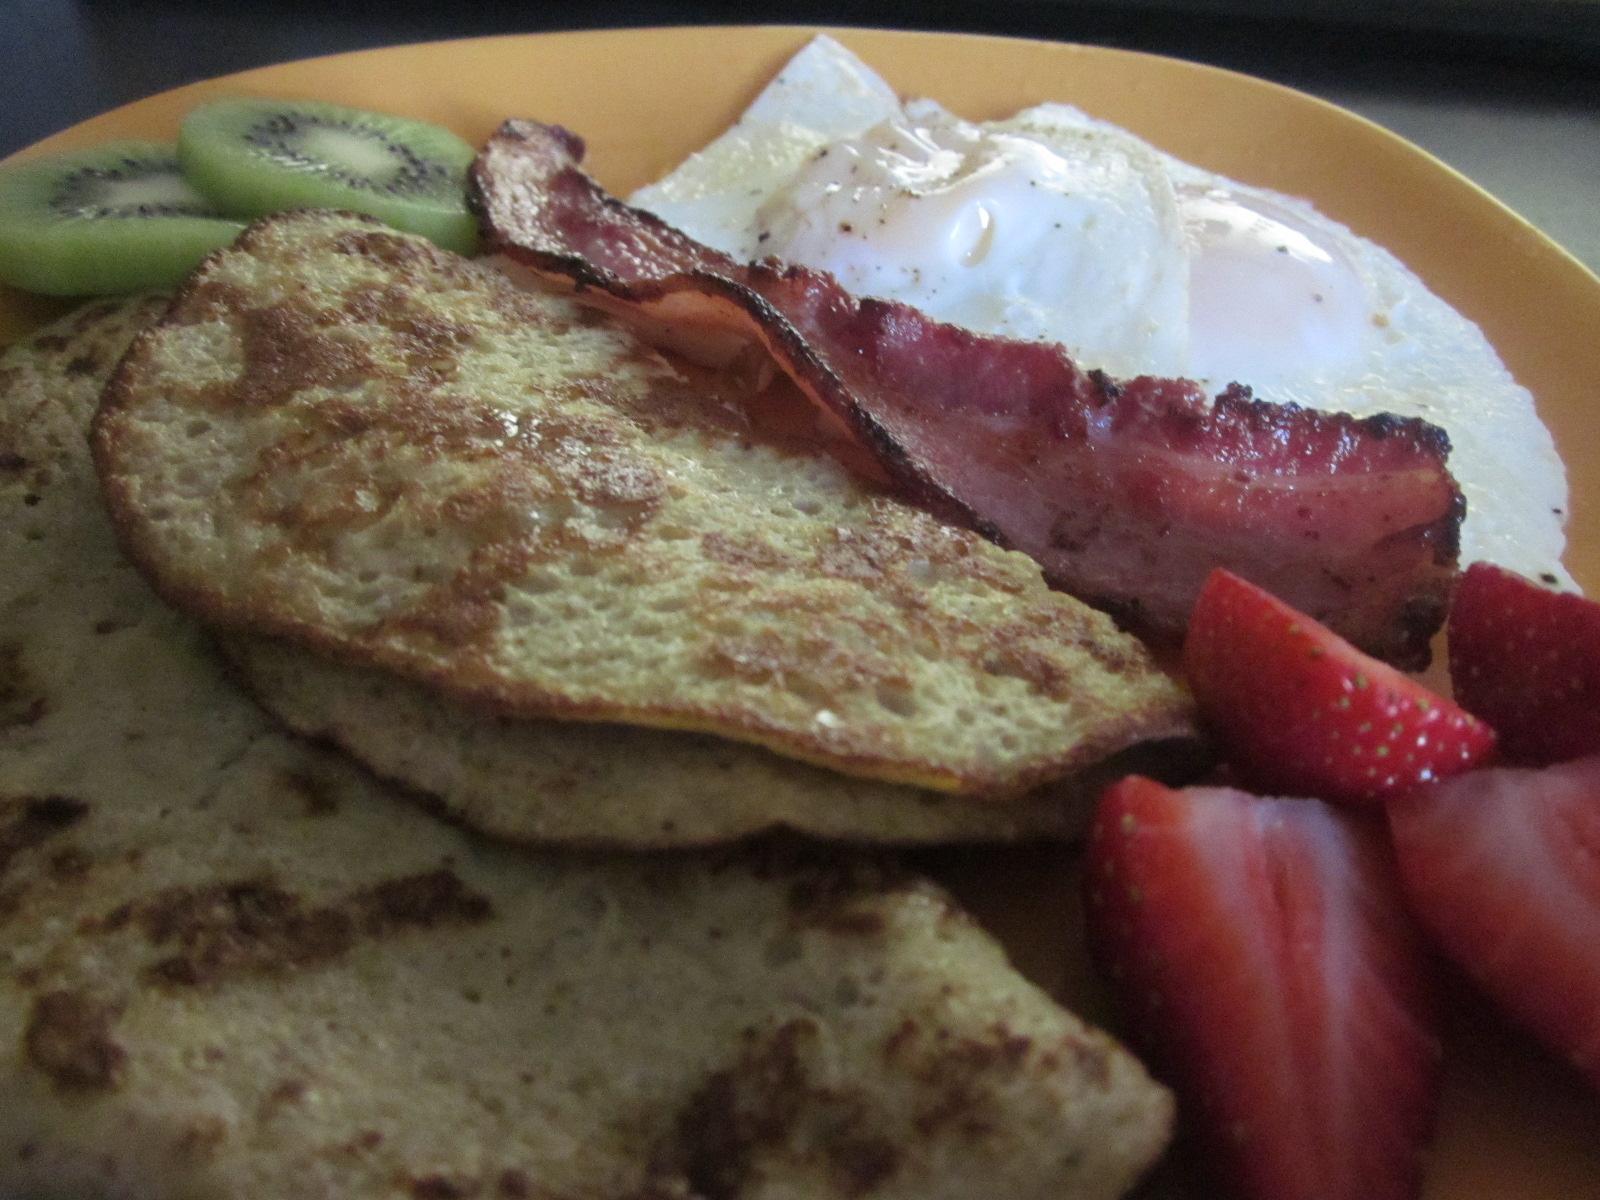 The Whimsical Momma: Recipe: Easy Whole30 Banana Pancakes!